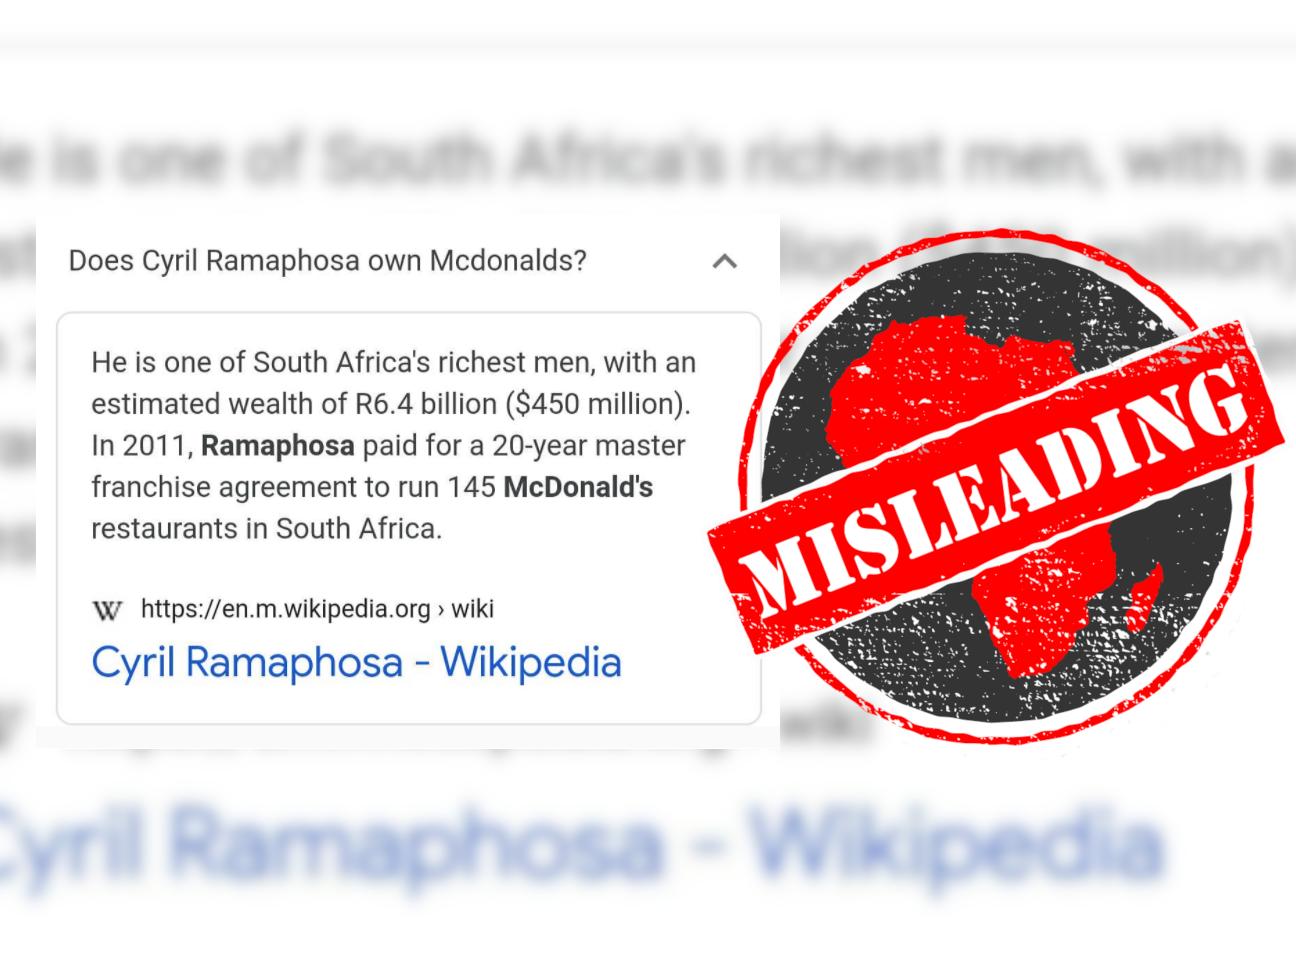 Ramaphosa_Misleading